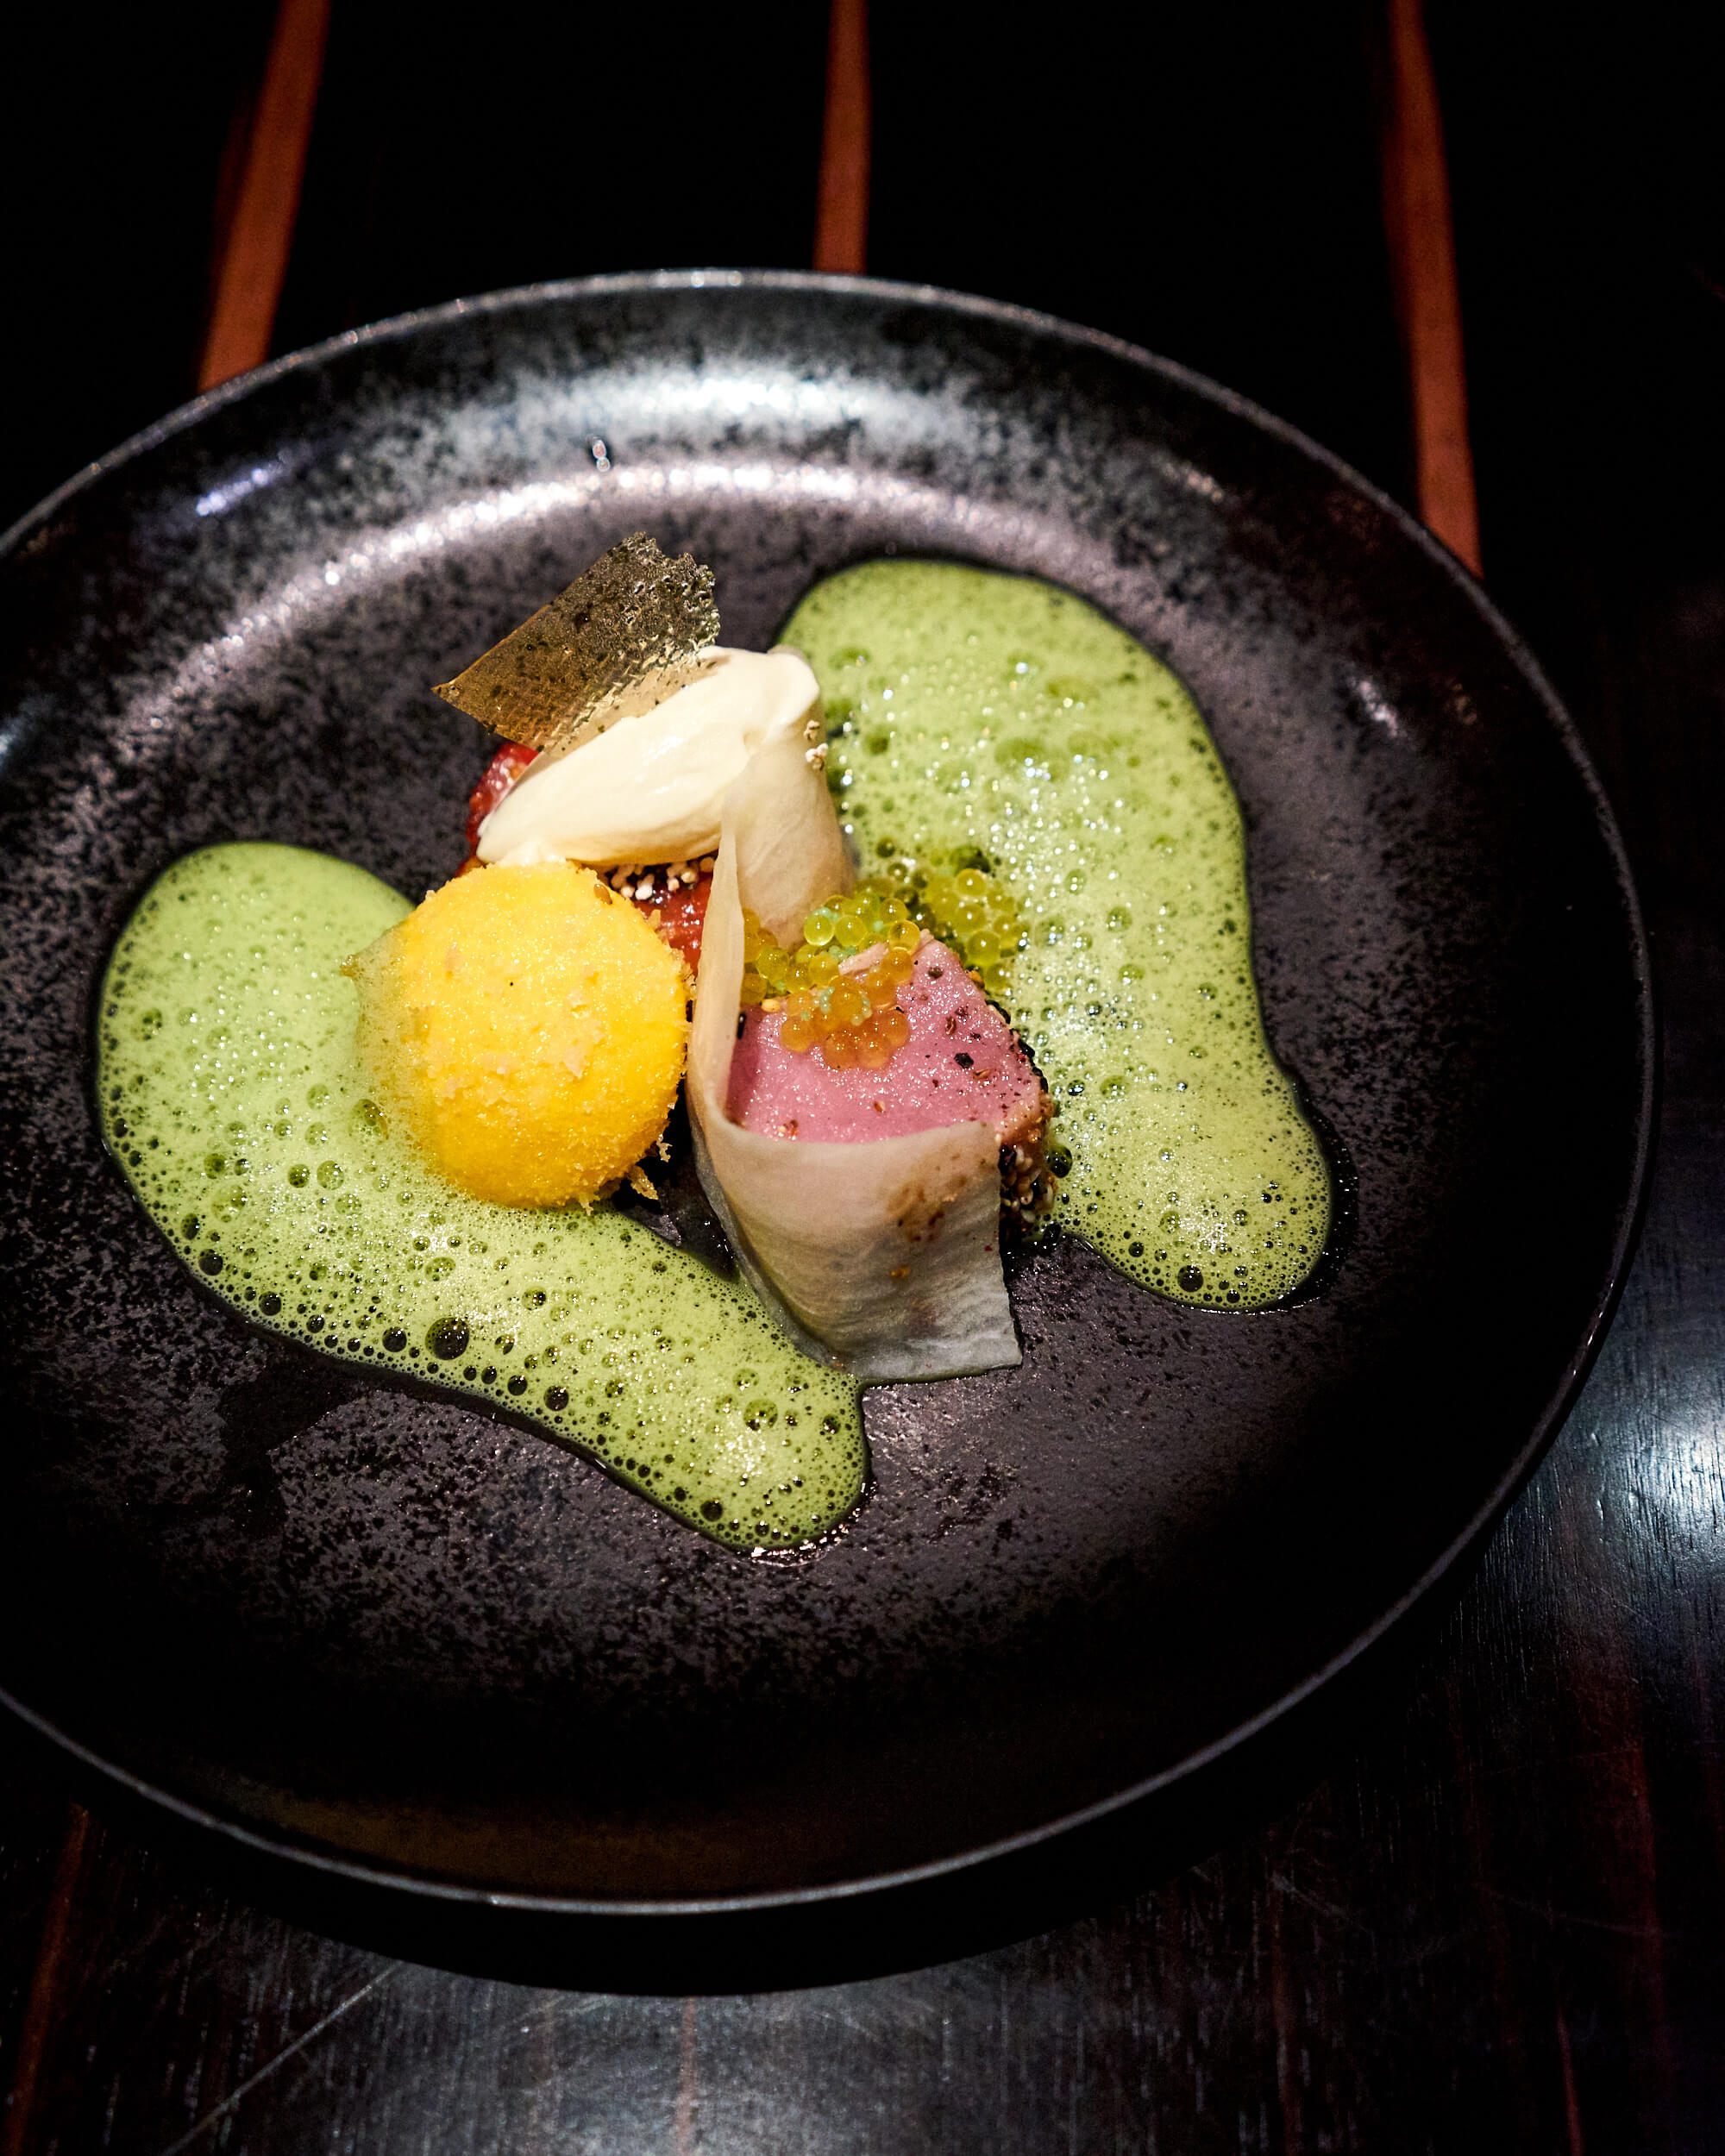 Restaurant Bachofer Waiblingen, Gelbflossenthunfisch